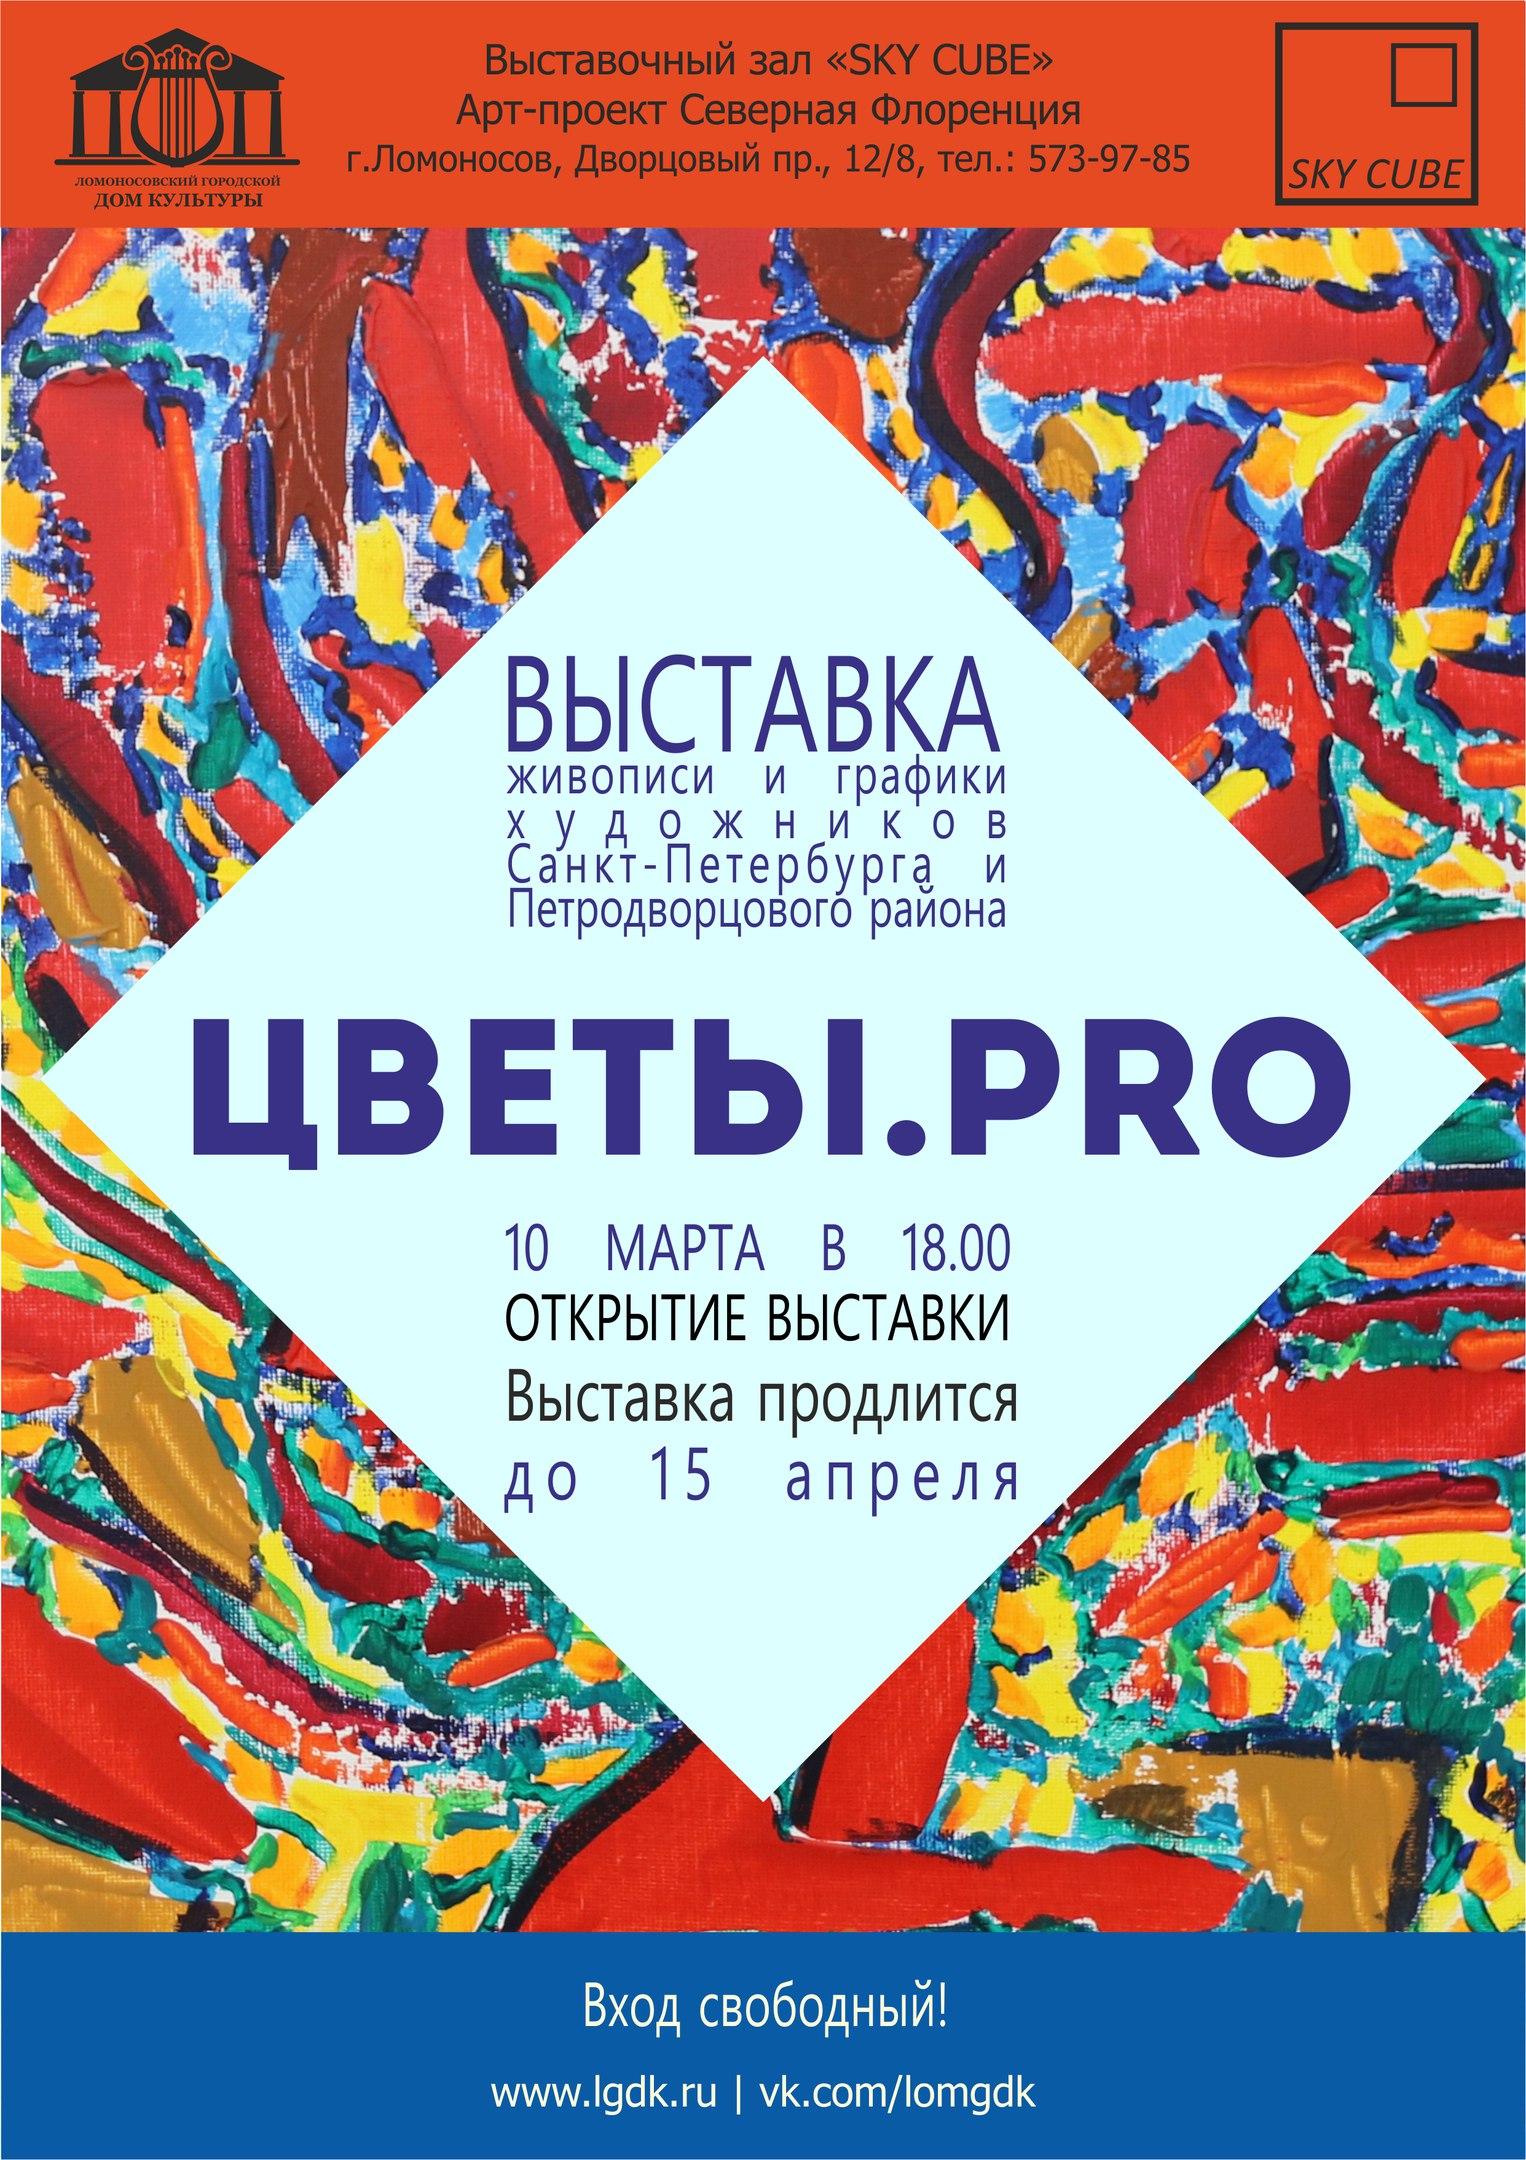 Poster. Flowers.pro. Lomonoson. 2018.